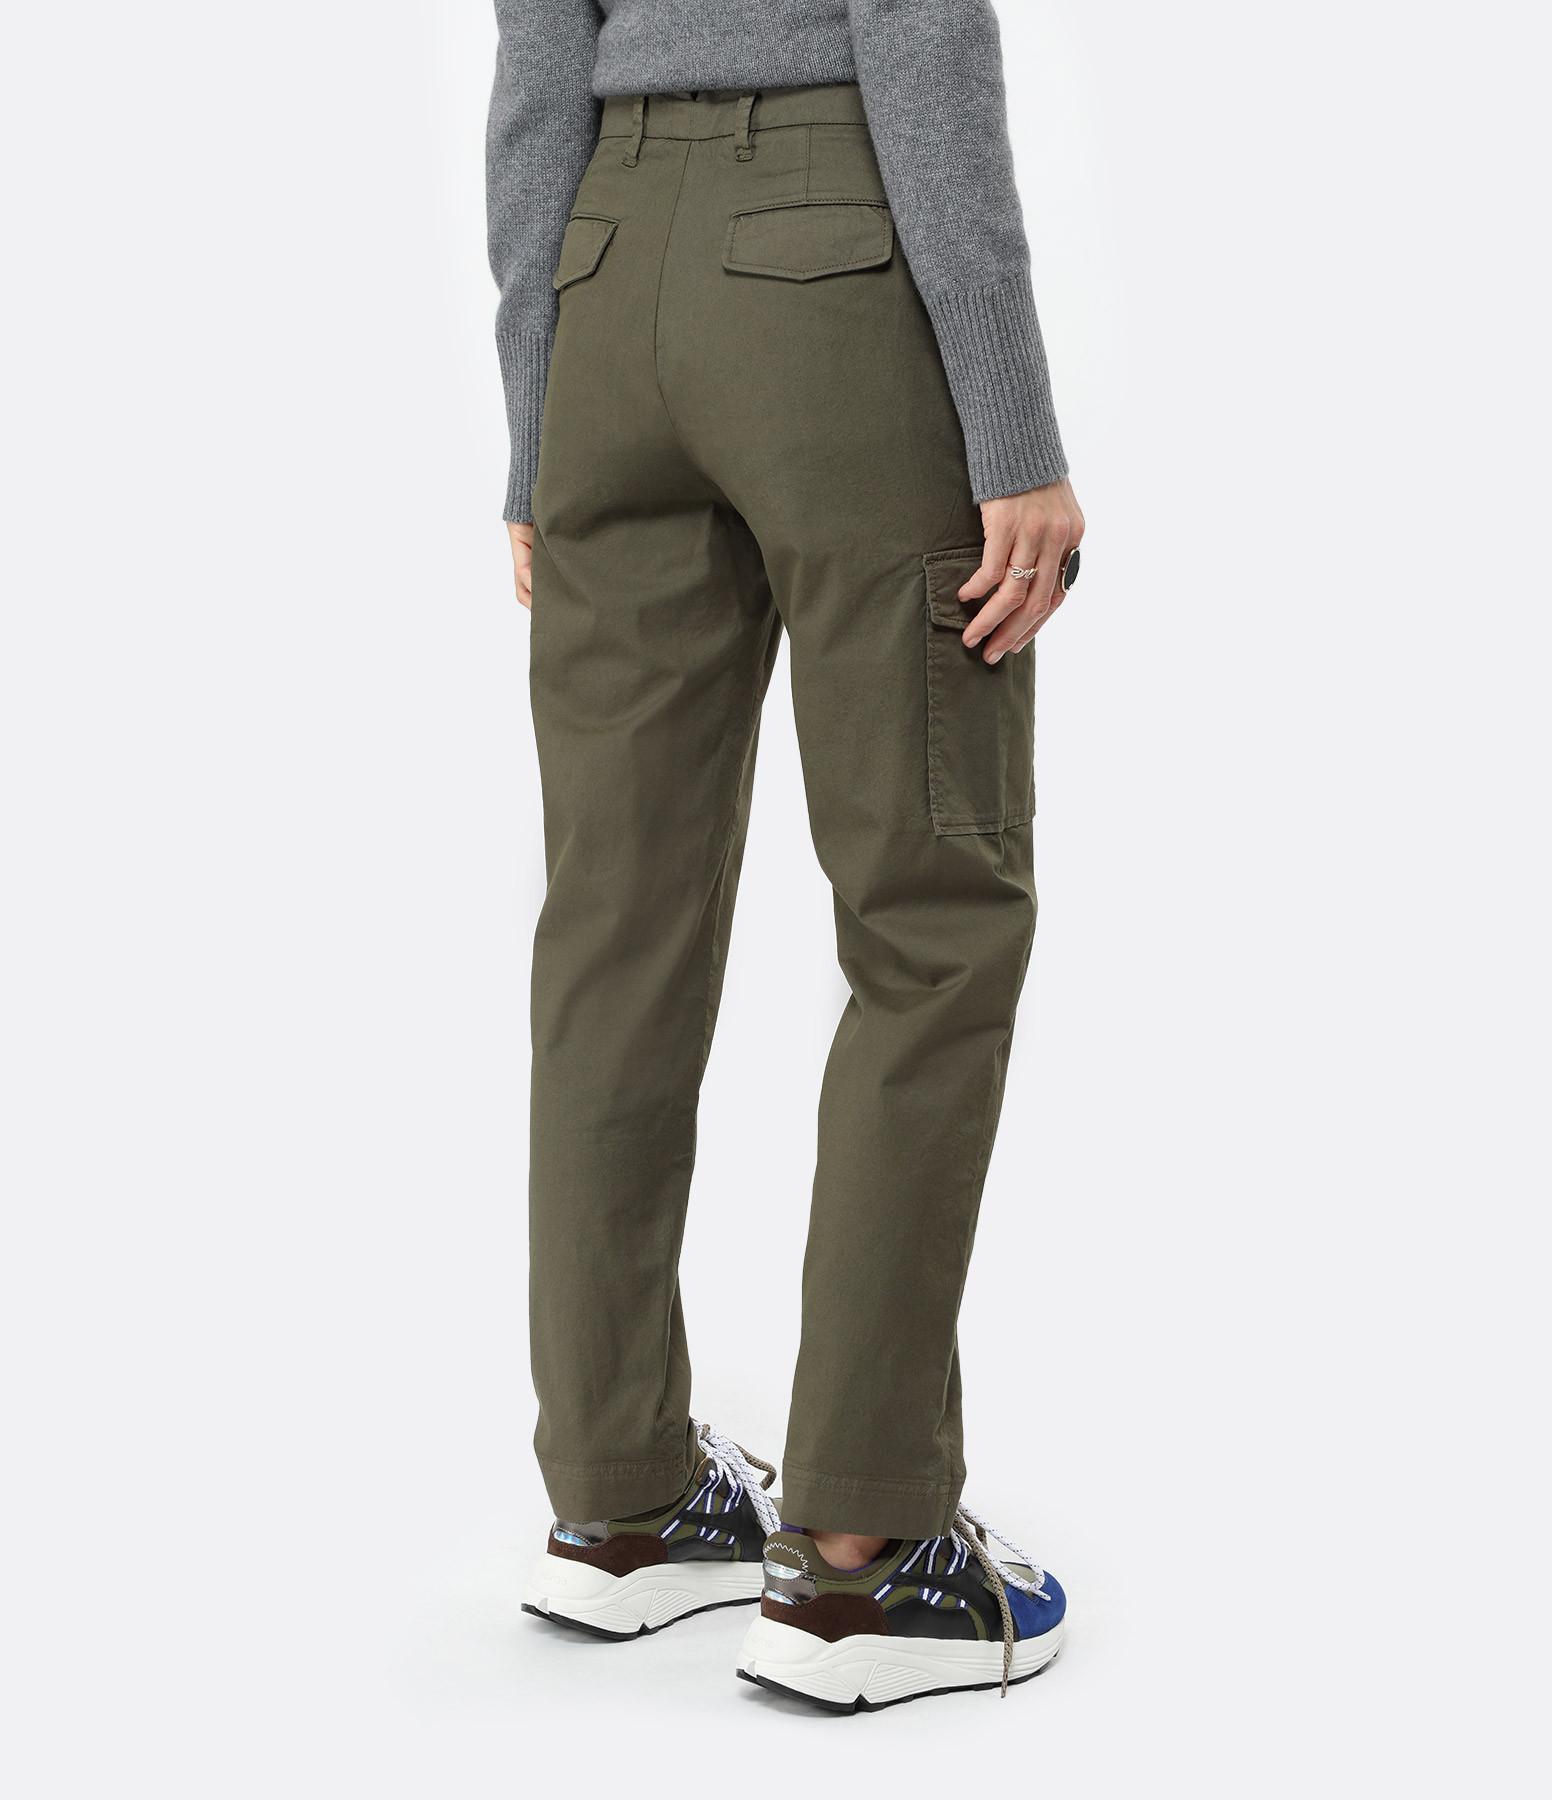 MAISON STANDARDS - Pantalon Militaire Kaki